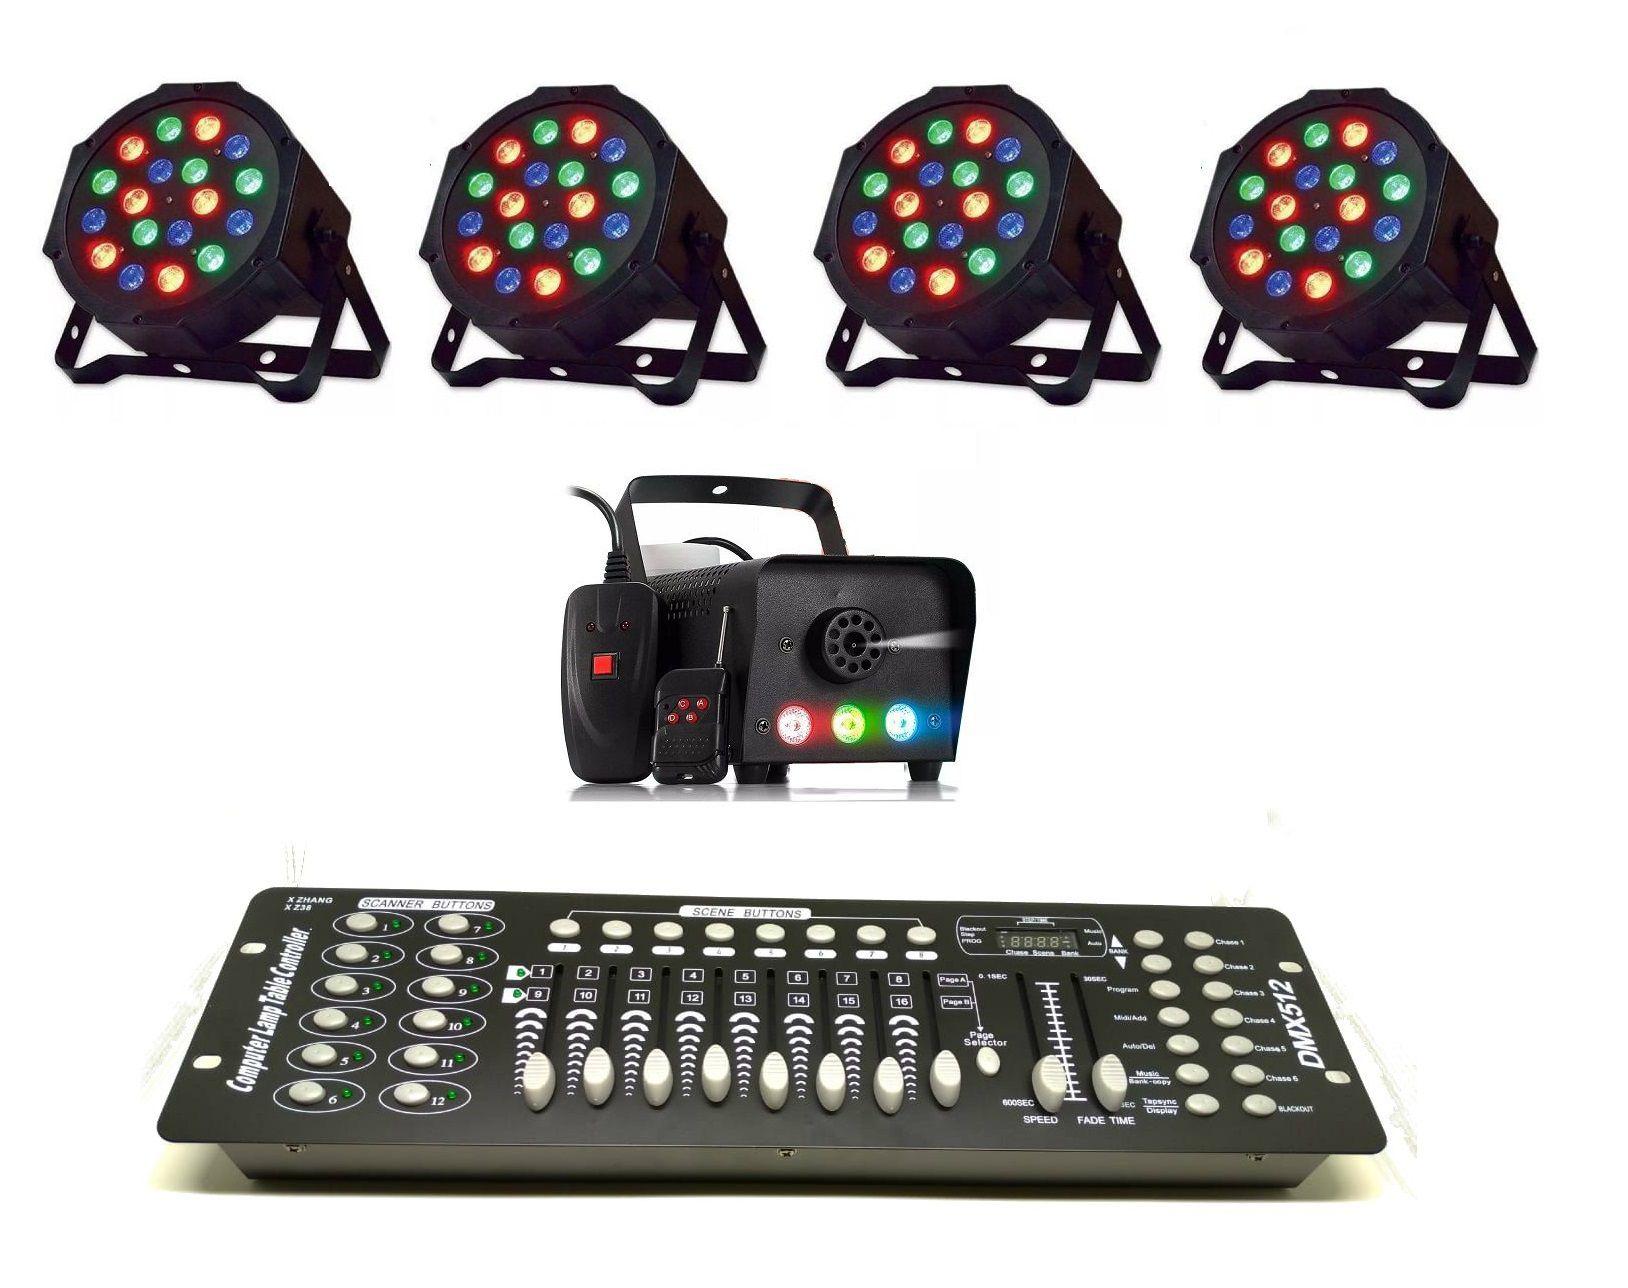 Kit 4x Canhão Luz 18 LEDs + Maquina Fumaça 600W 3 LEDs + Mesa DMX - 18LEDSLIM+XH-600W+HL-001